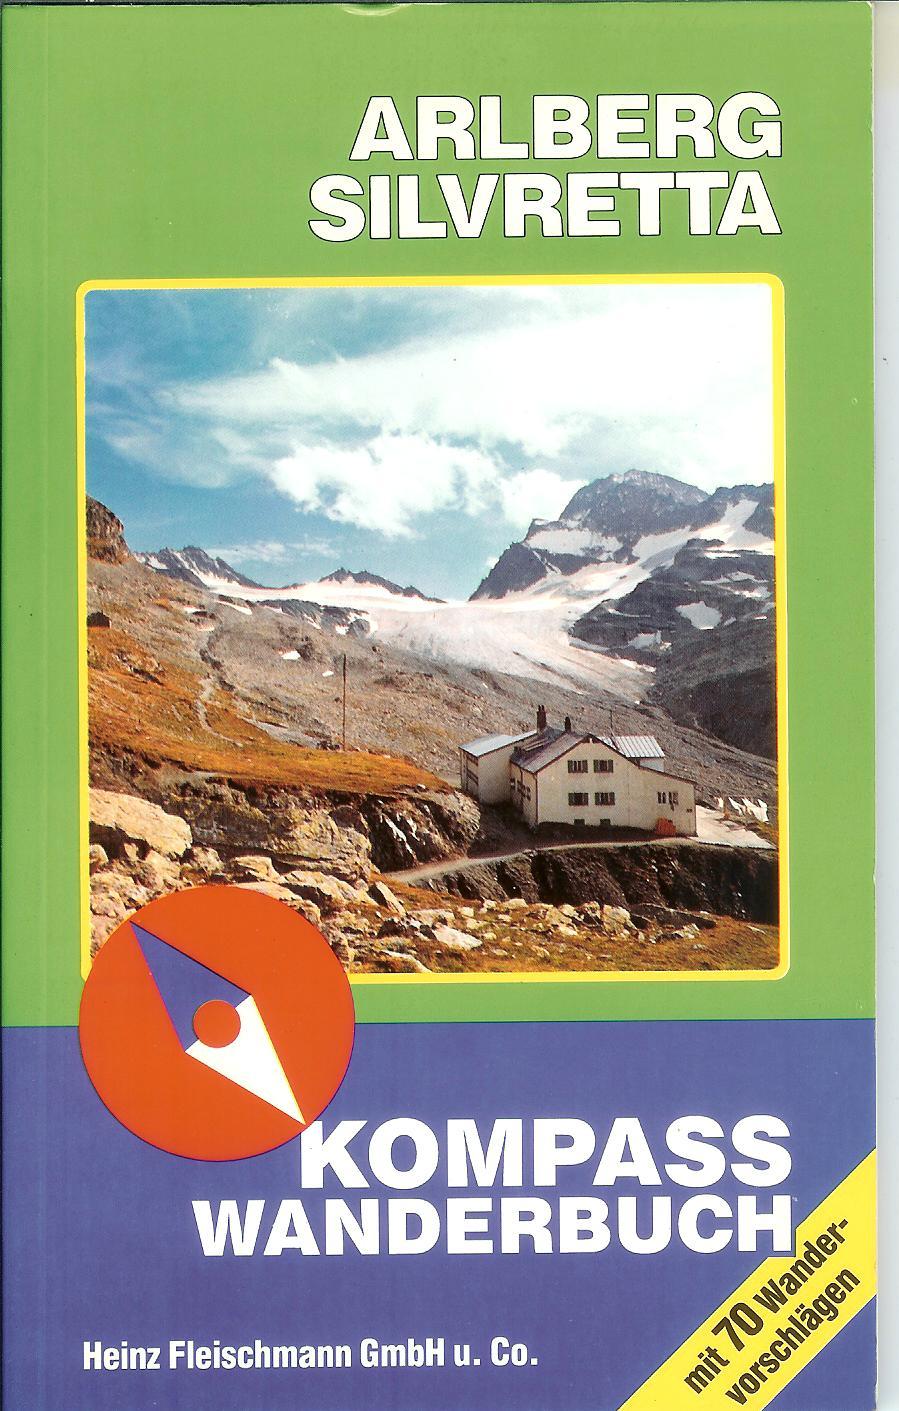 Arlberg, Silvretta